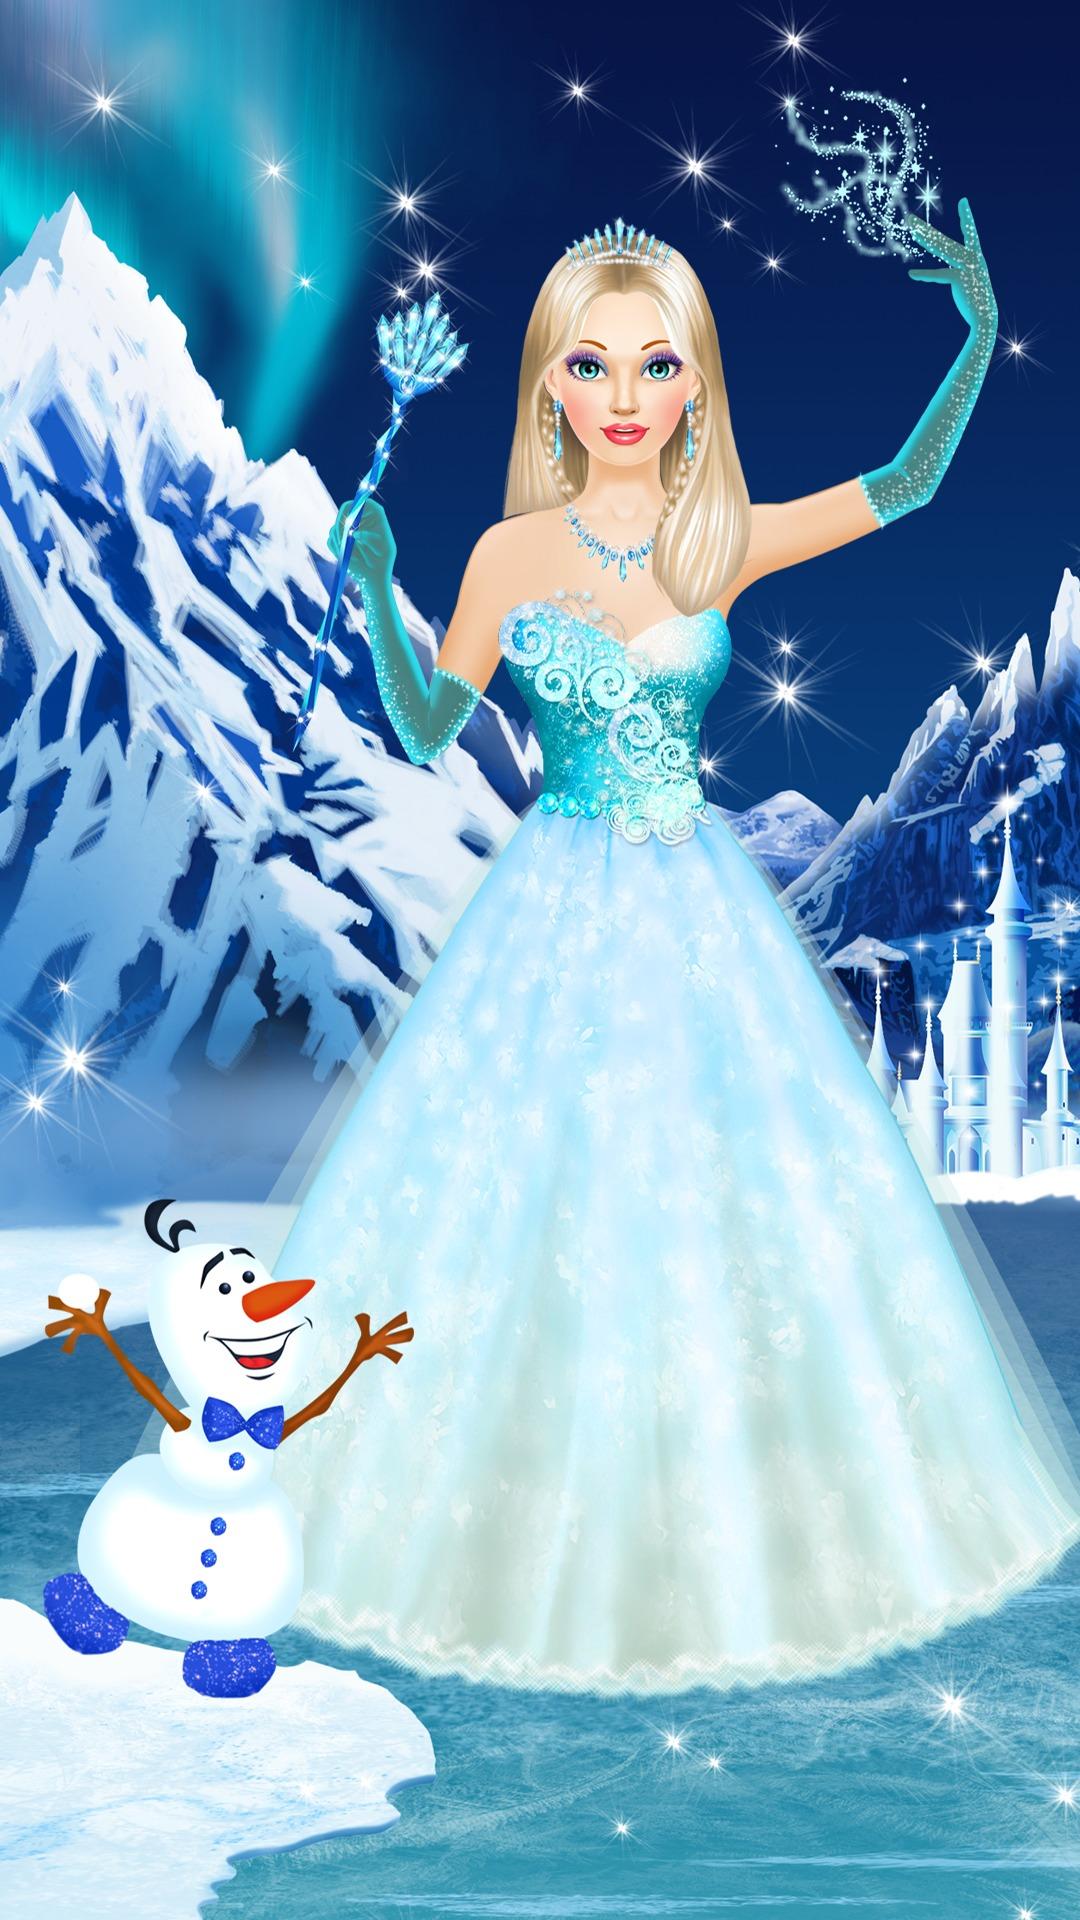 Amazon.com: Ice Queen Salon: Spa, Makeup and Dress Up: princess ...